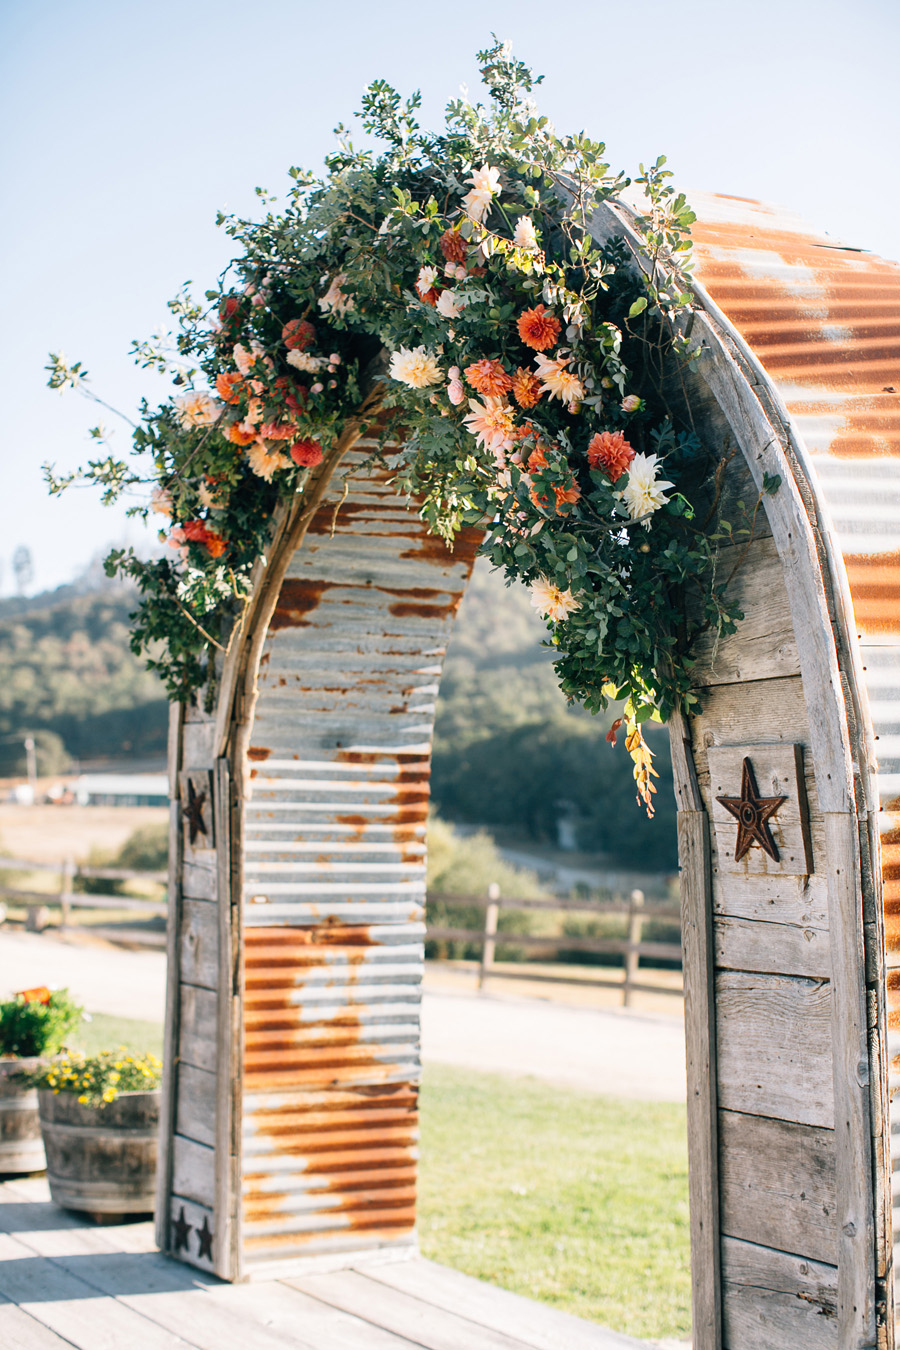 Jen_Rodriguez-Holland_Ranch_wedding04.JPG